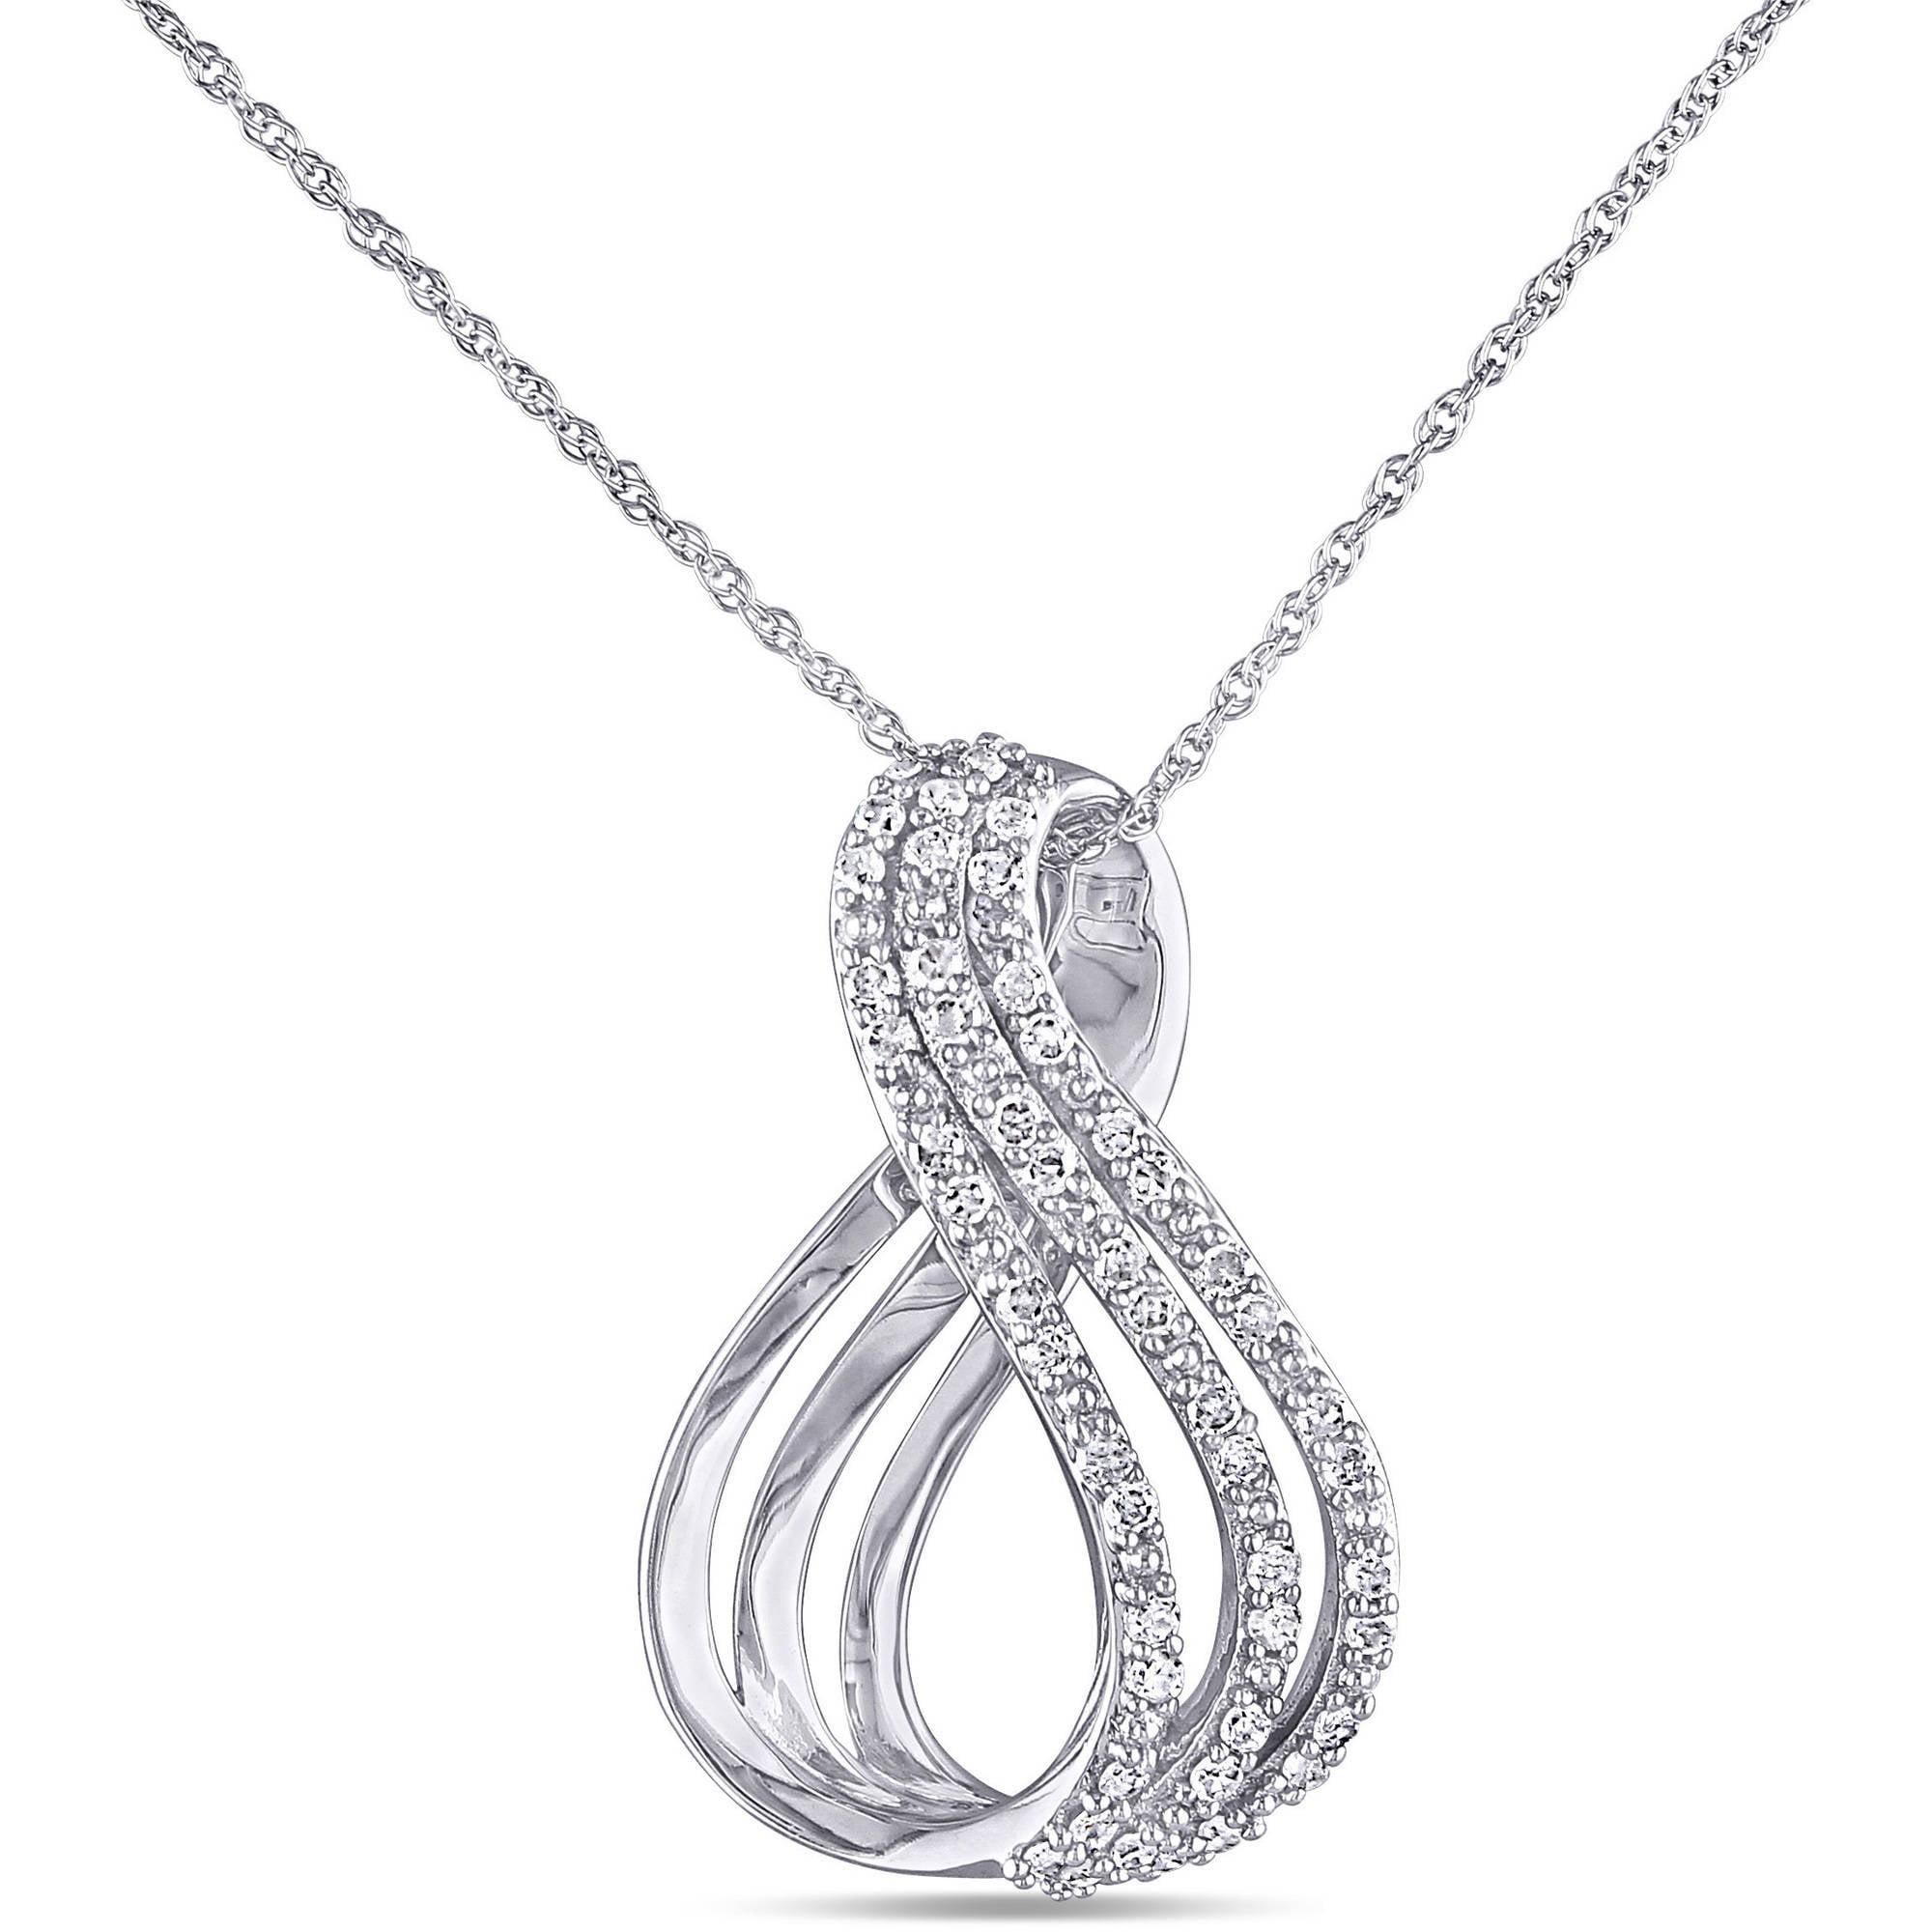 Miabella 1/4 Carat T.W. Diamond 10kt White Gold Infinity Pendant